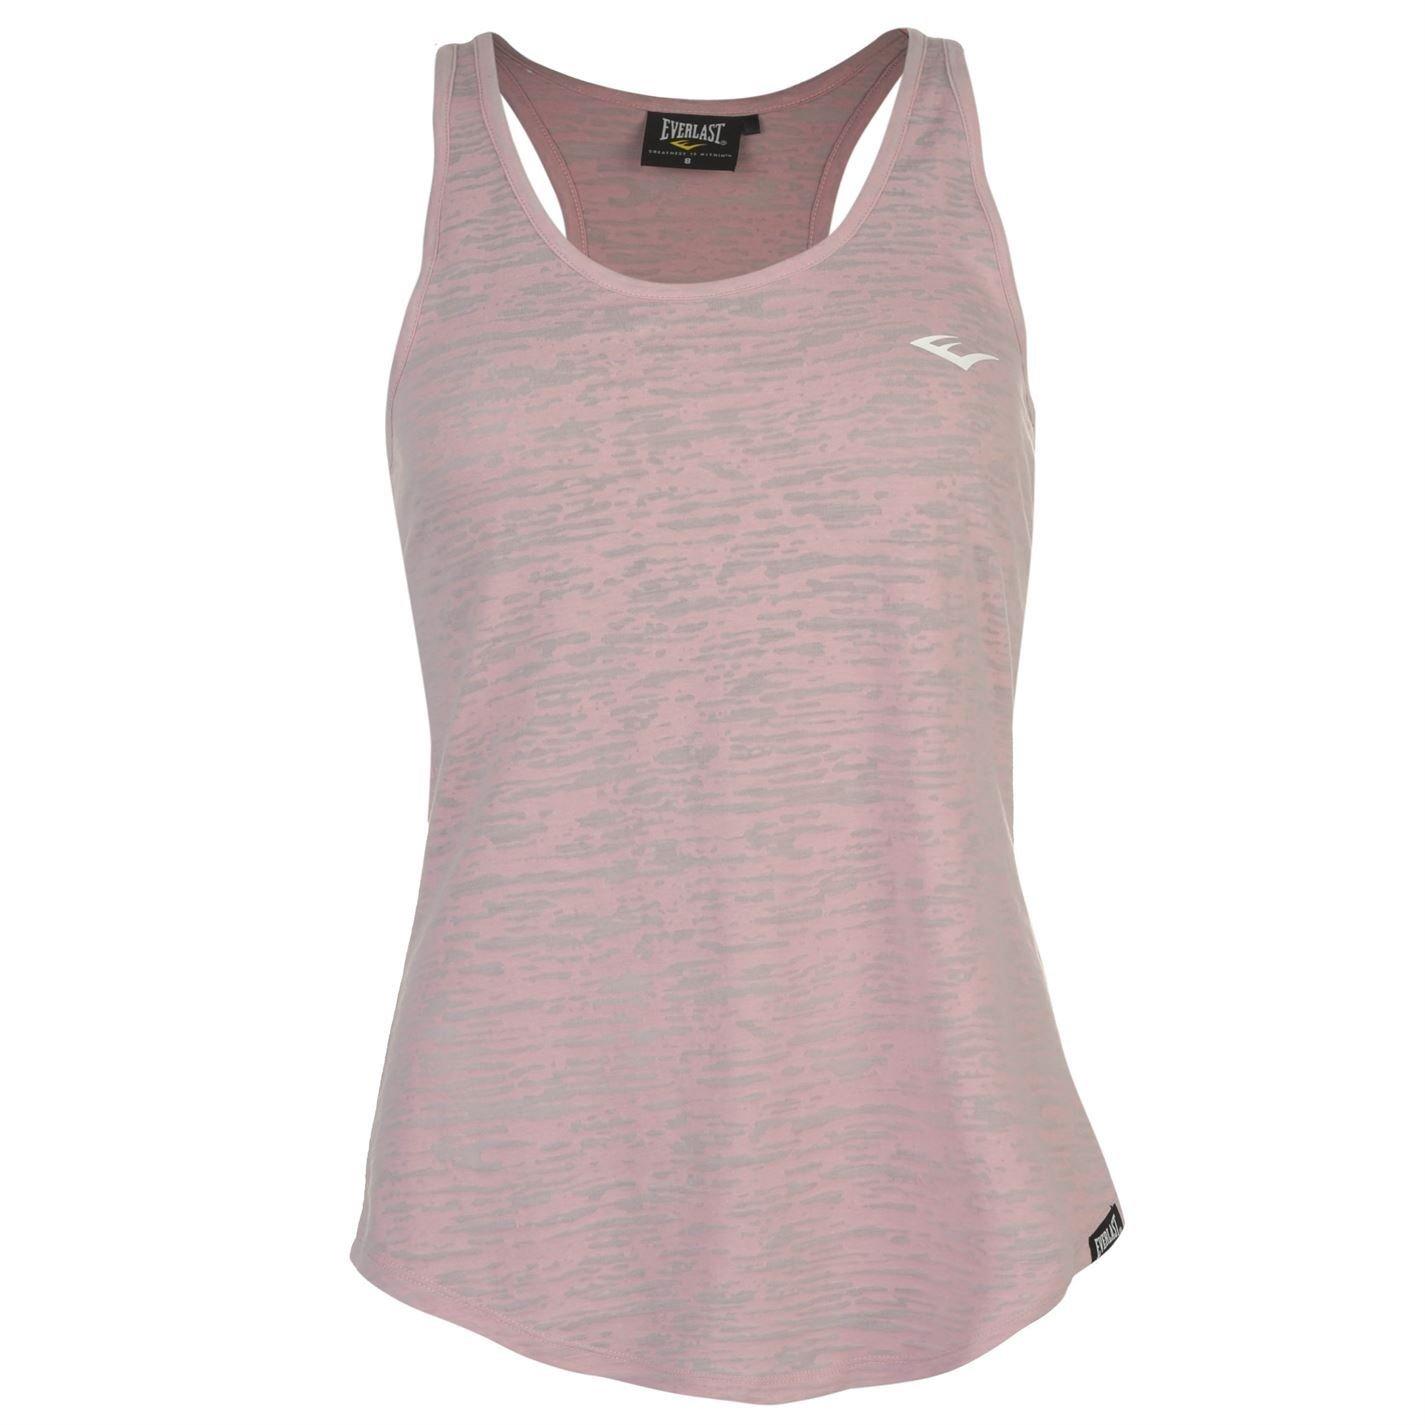 Everlast Womens Burn Vest Tank Top Lightweight Racer Back Print Sleeveless:  Amazon.co.uk: Clothing